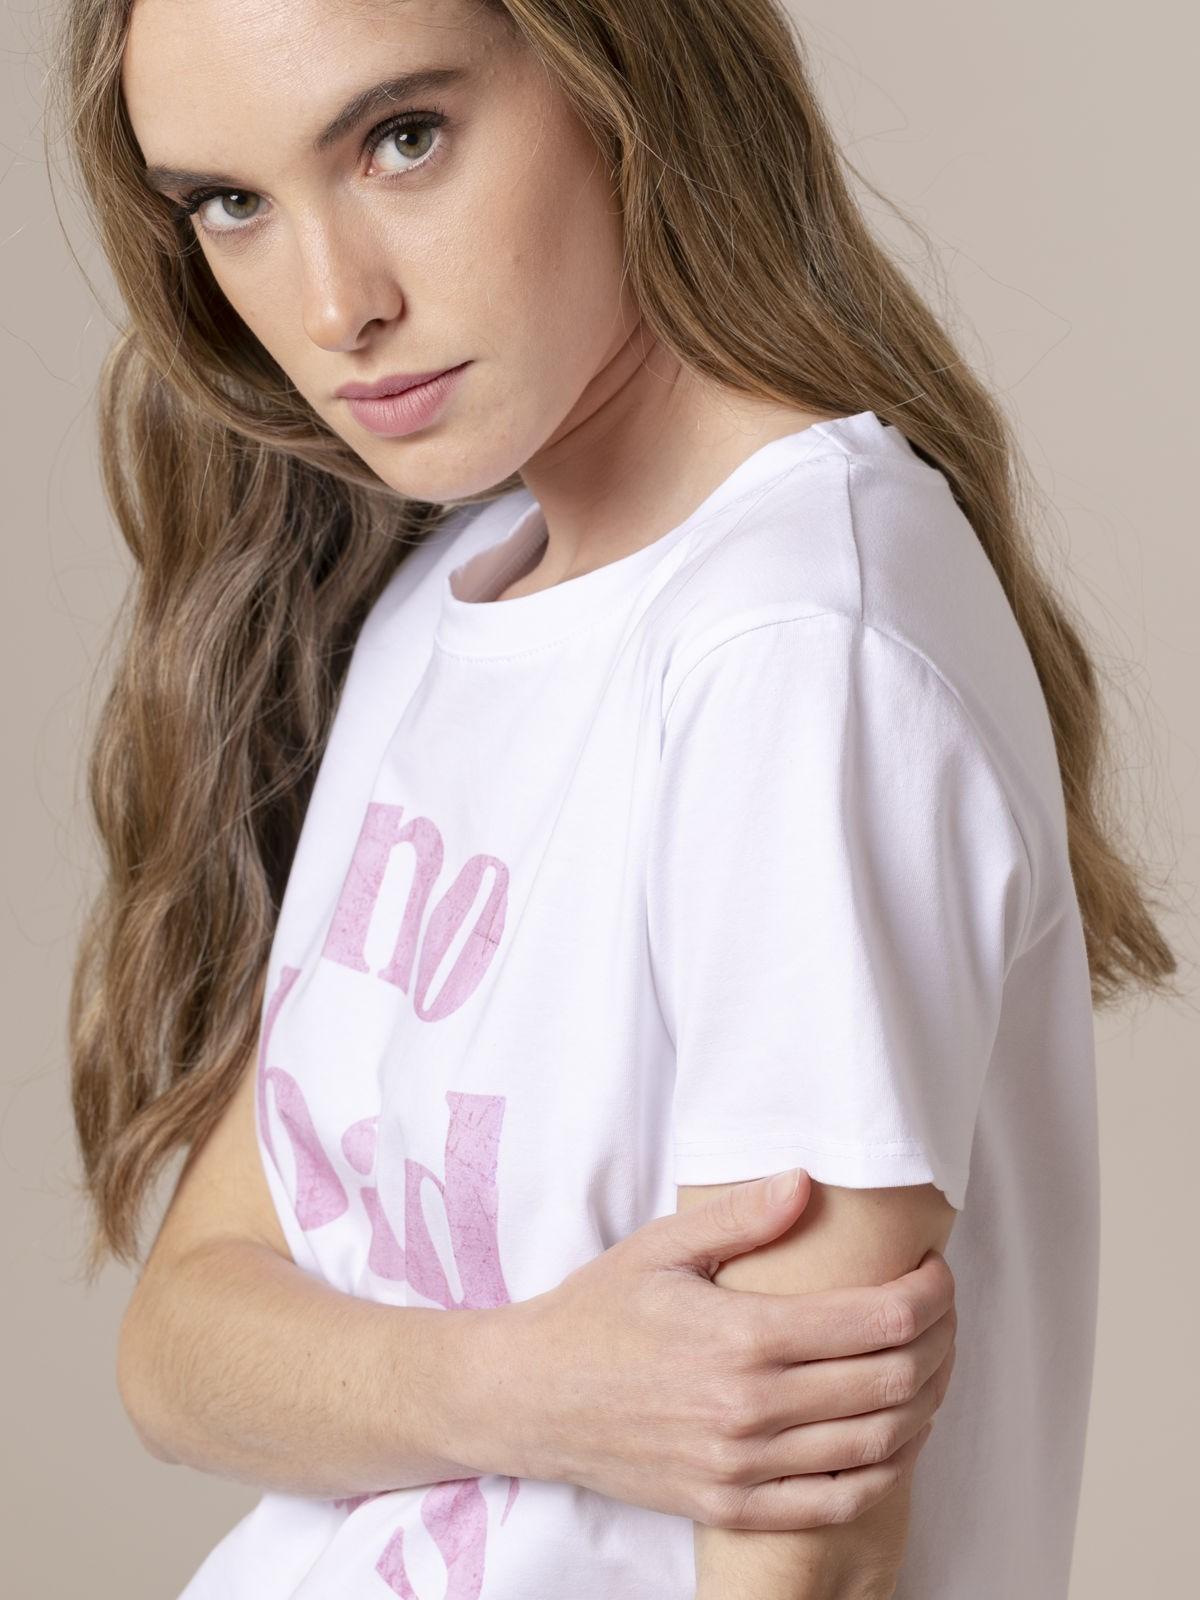 Woman Woman No bad day message t-shirt Pink